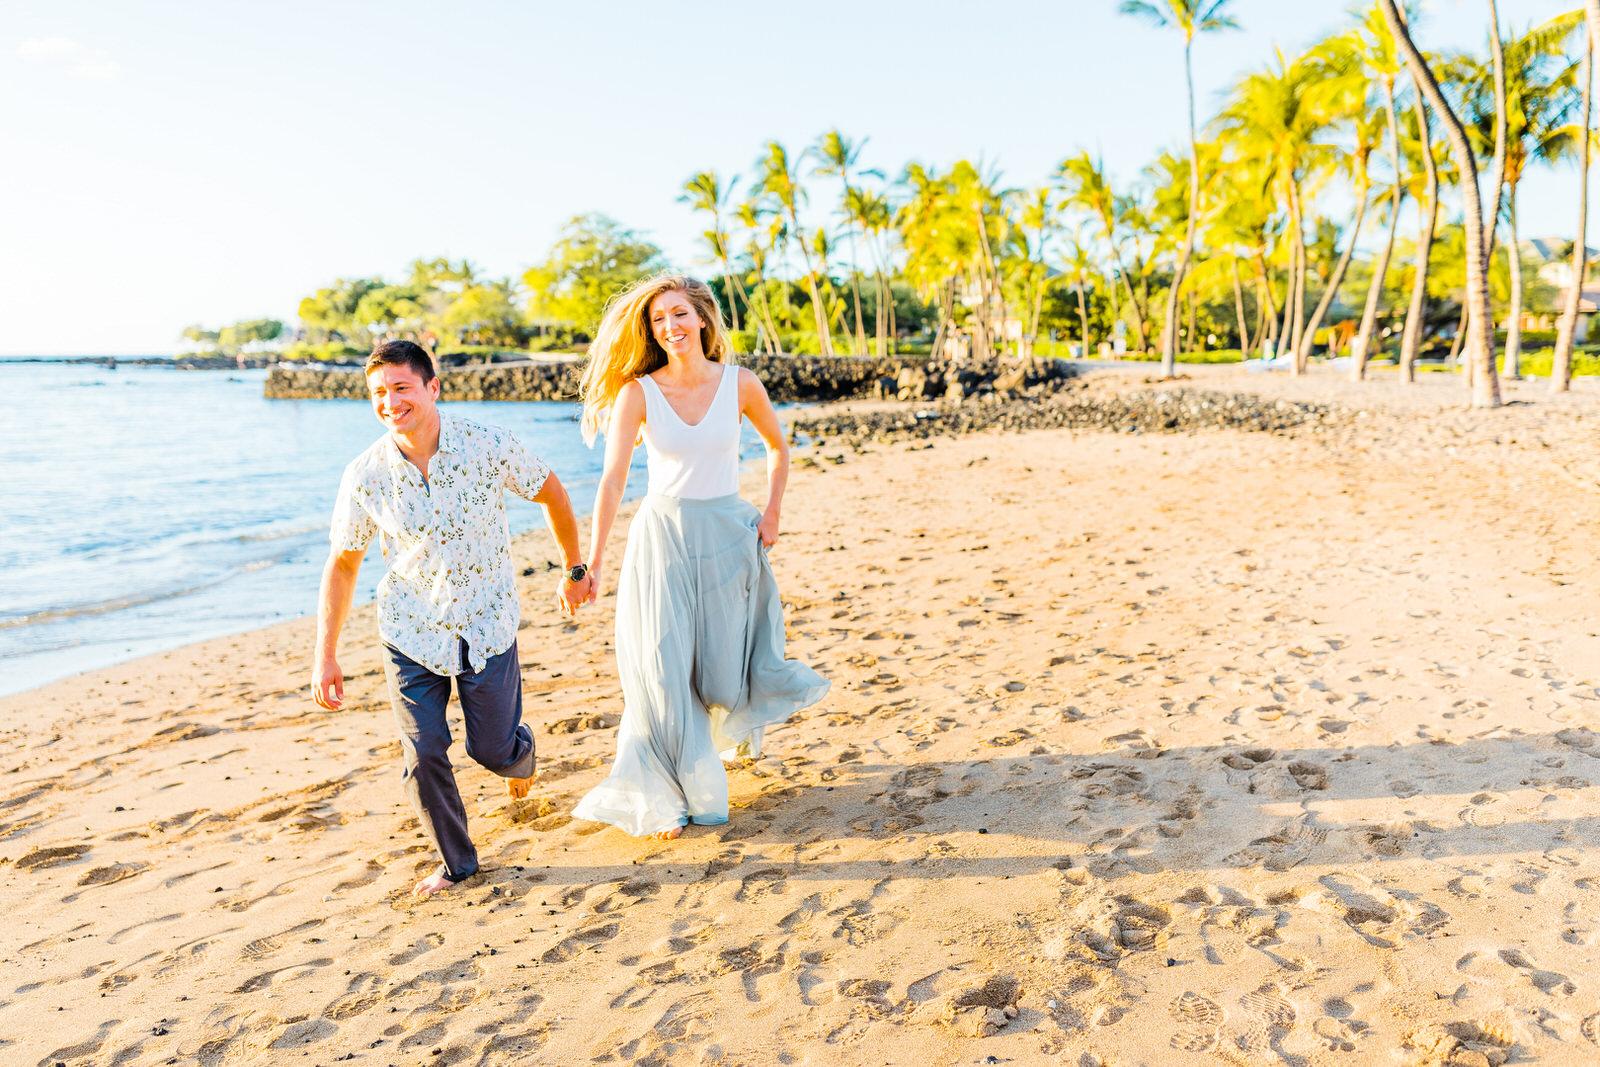 sunset-adventurous-couple-water-session-hilton-hawaii-7.jpg